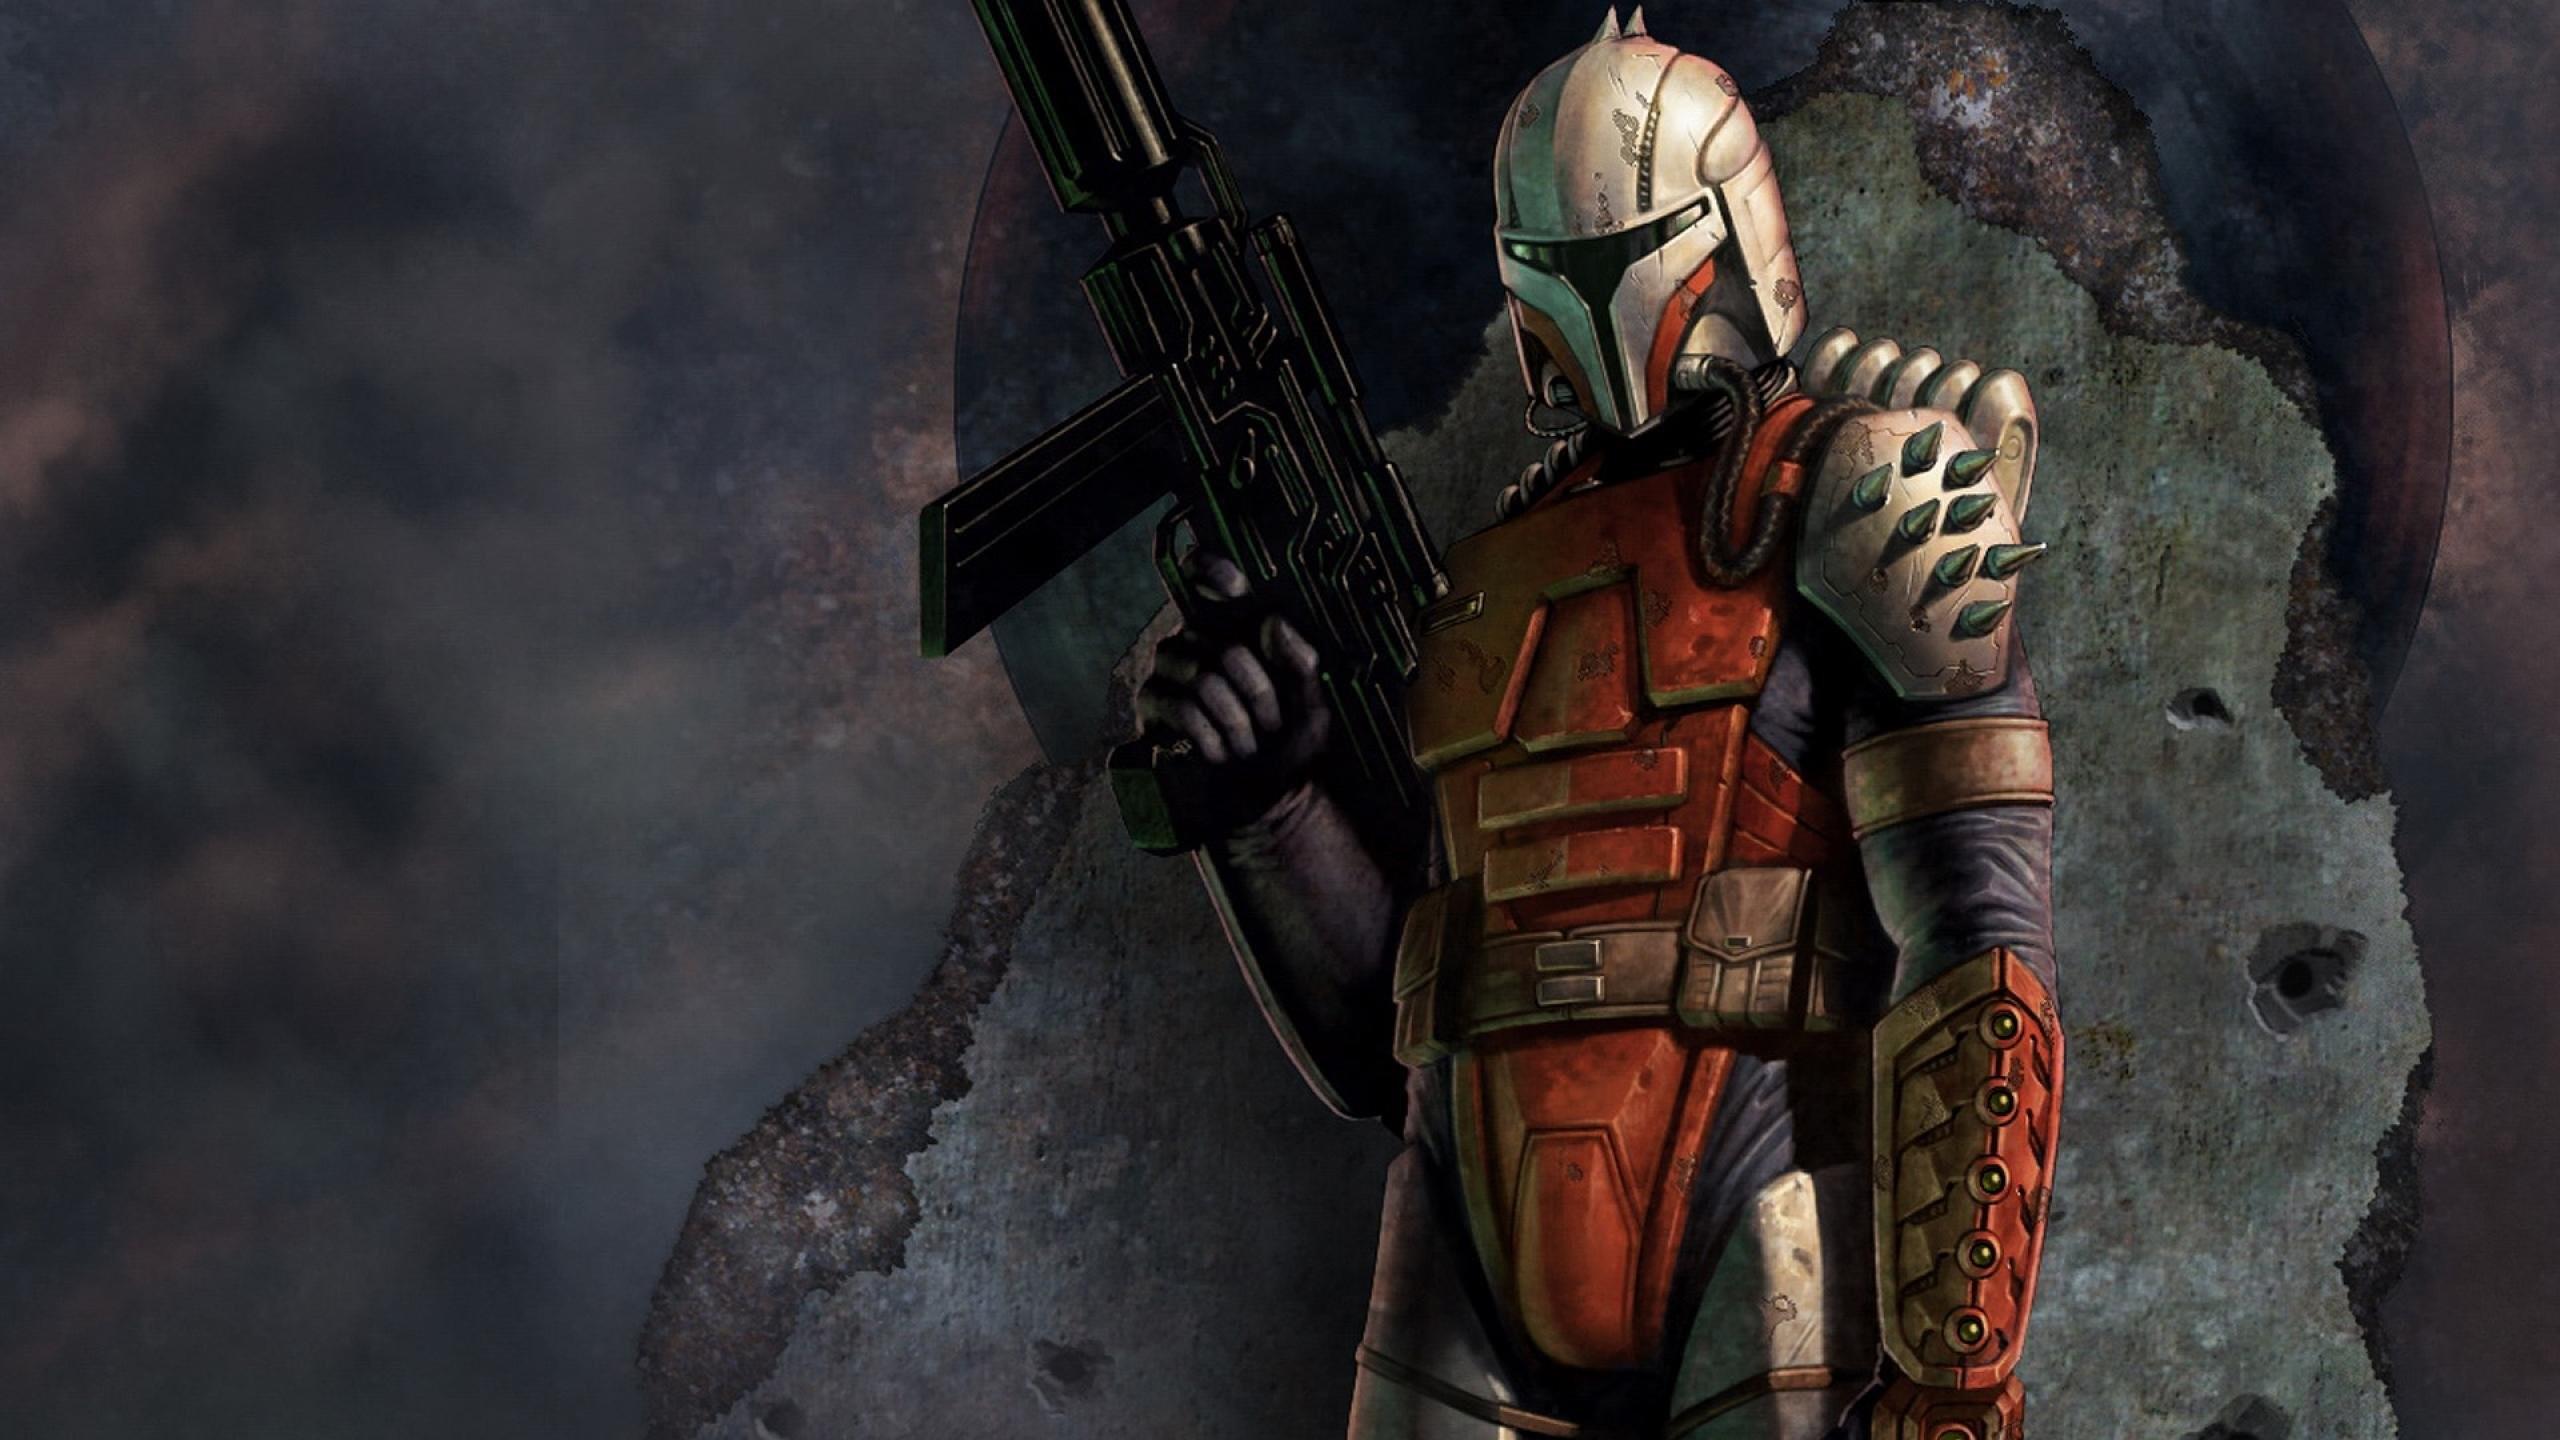 Res: 2560x1440, bounty hunter star wars